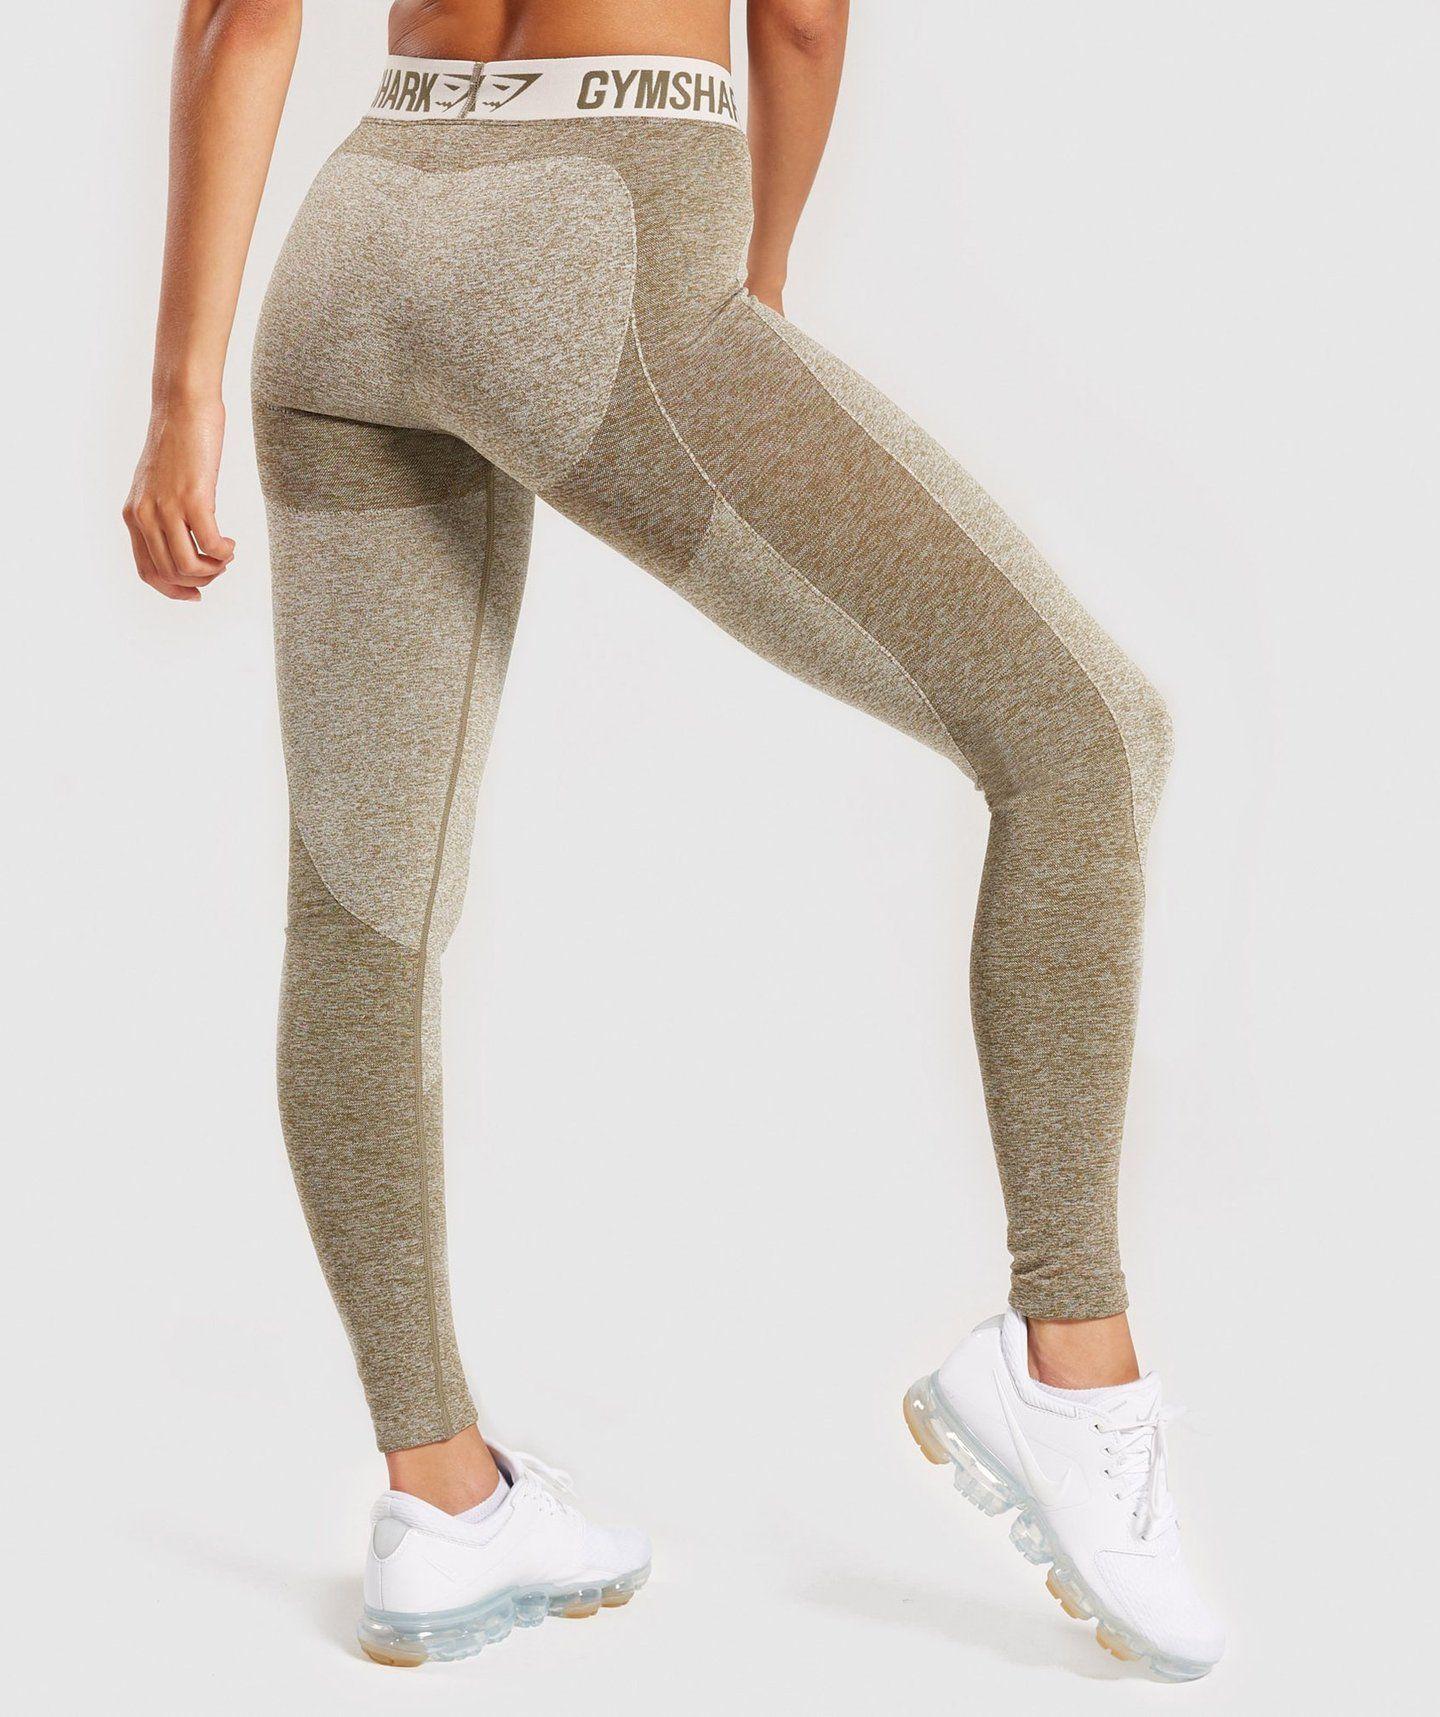 8371922e5f373 Gymshark Flex Leggings - Khaki/Sand 4 | gym wear